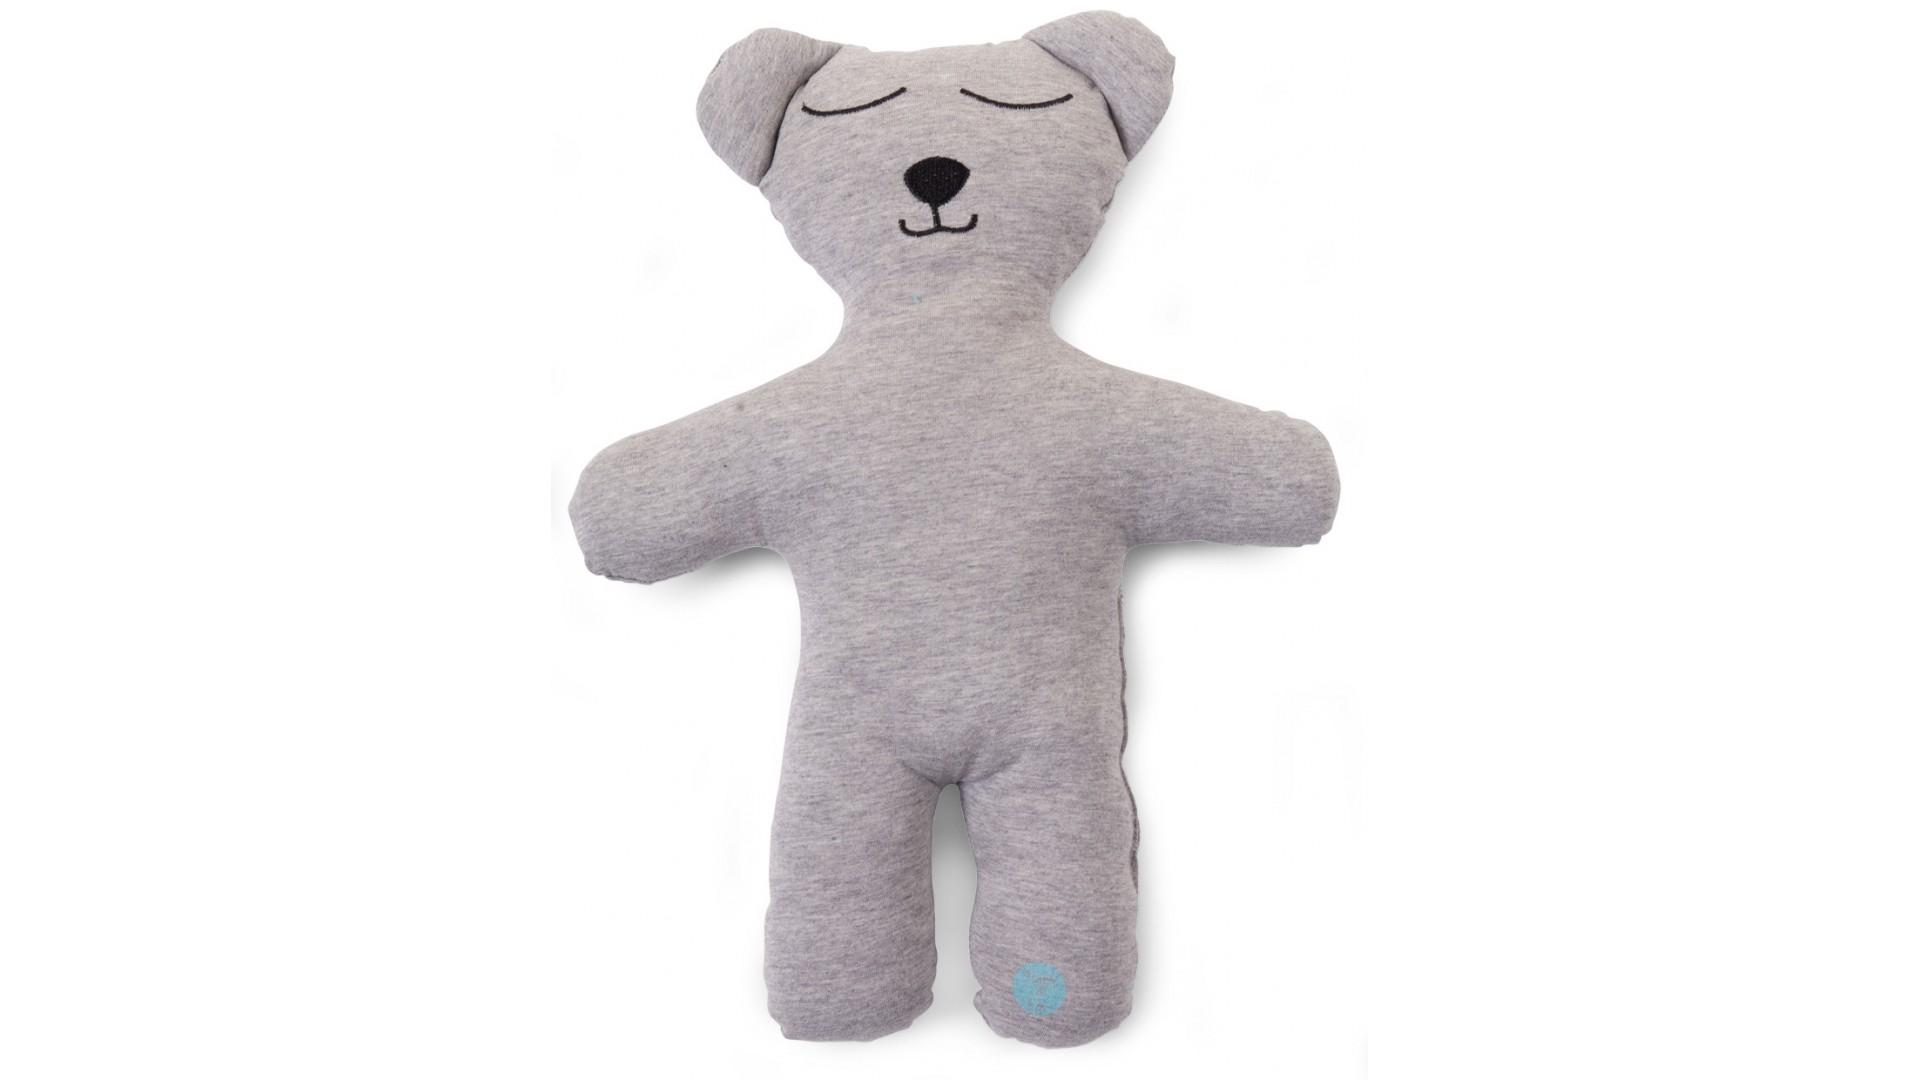 Doudou Jersey gris Teddy bear Natti & Co - CHILDWOOD